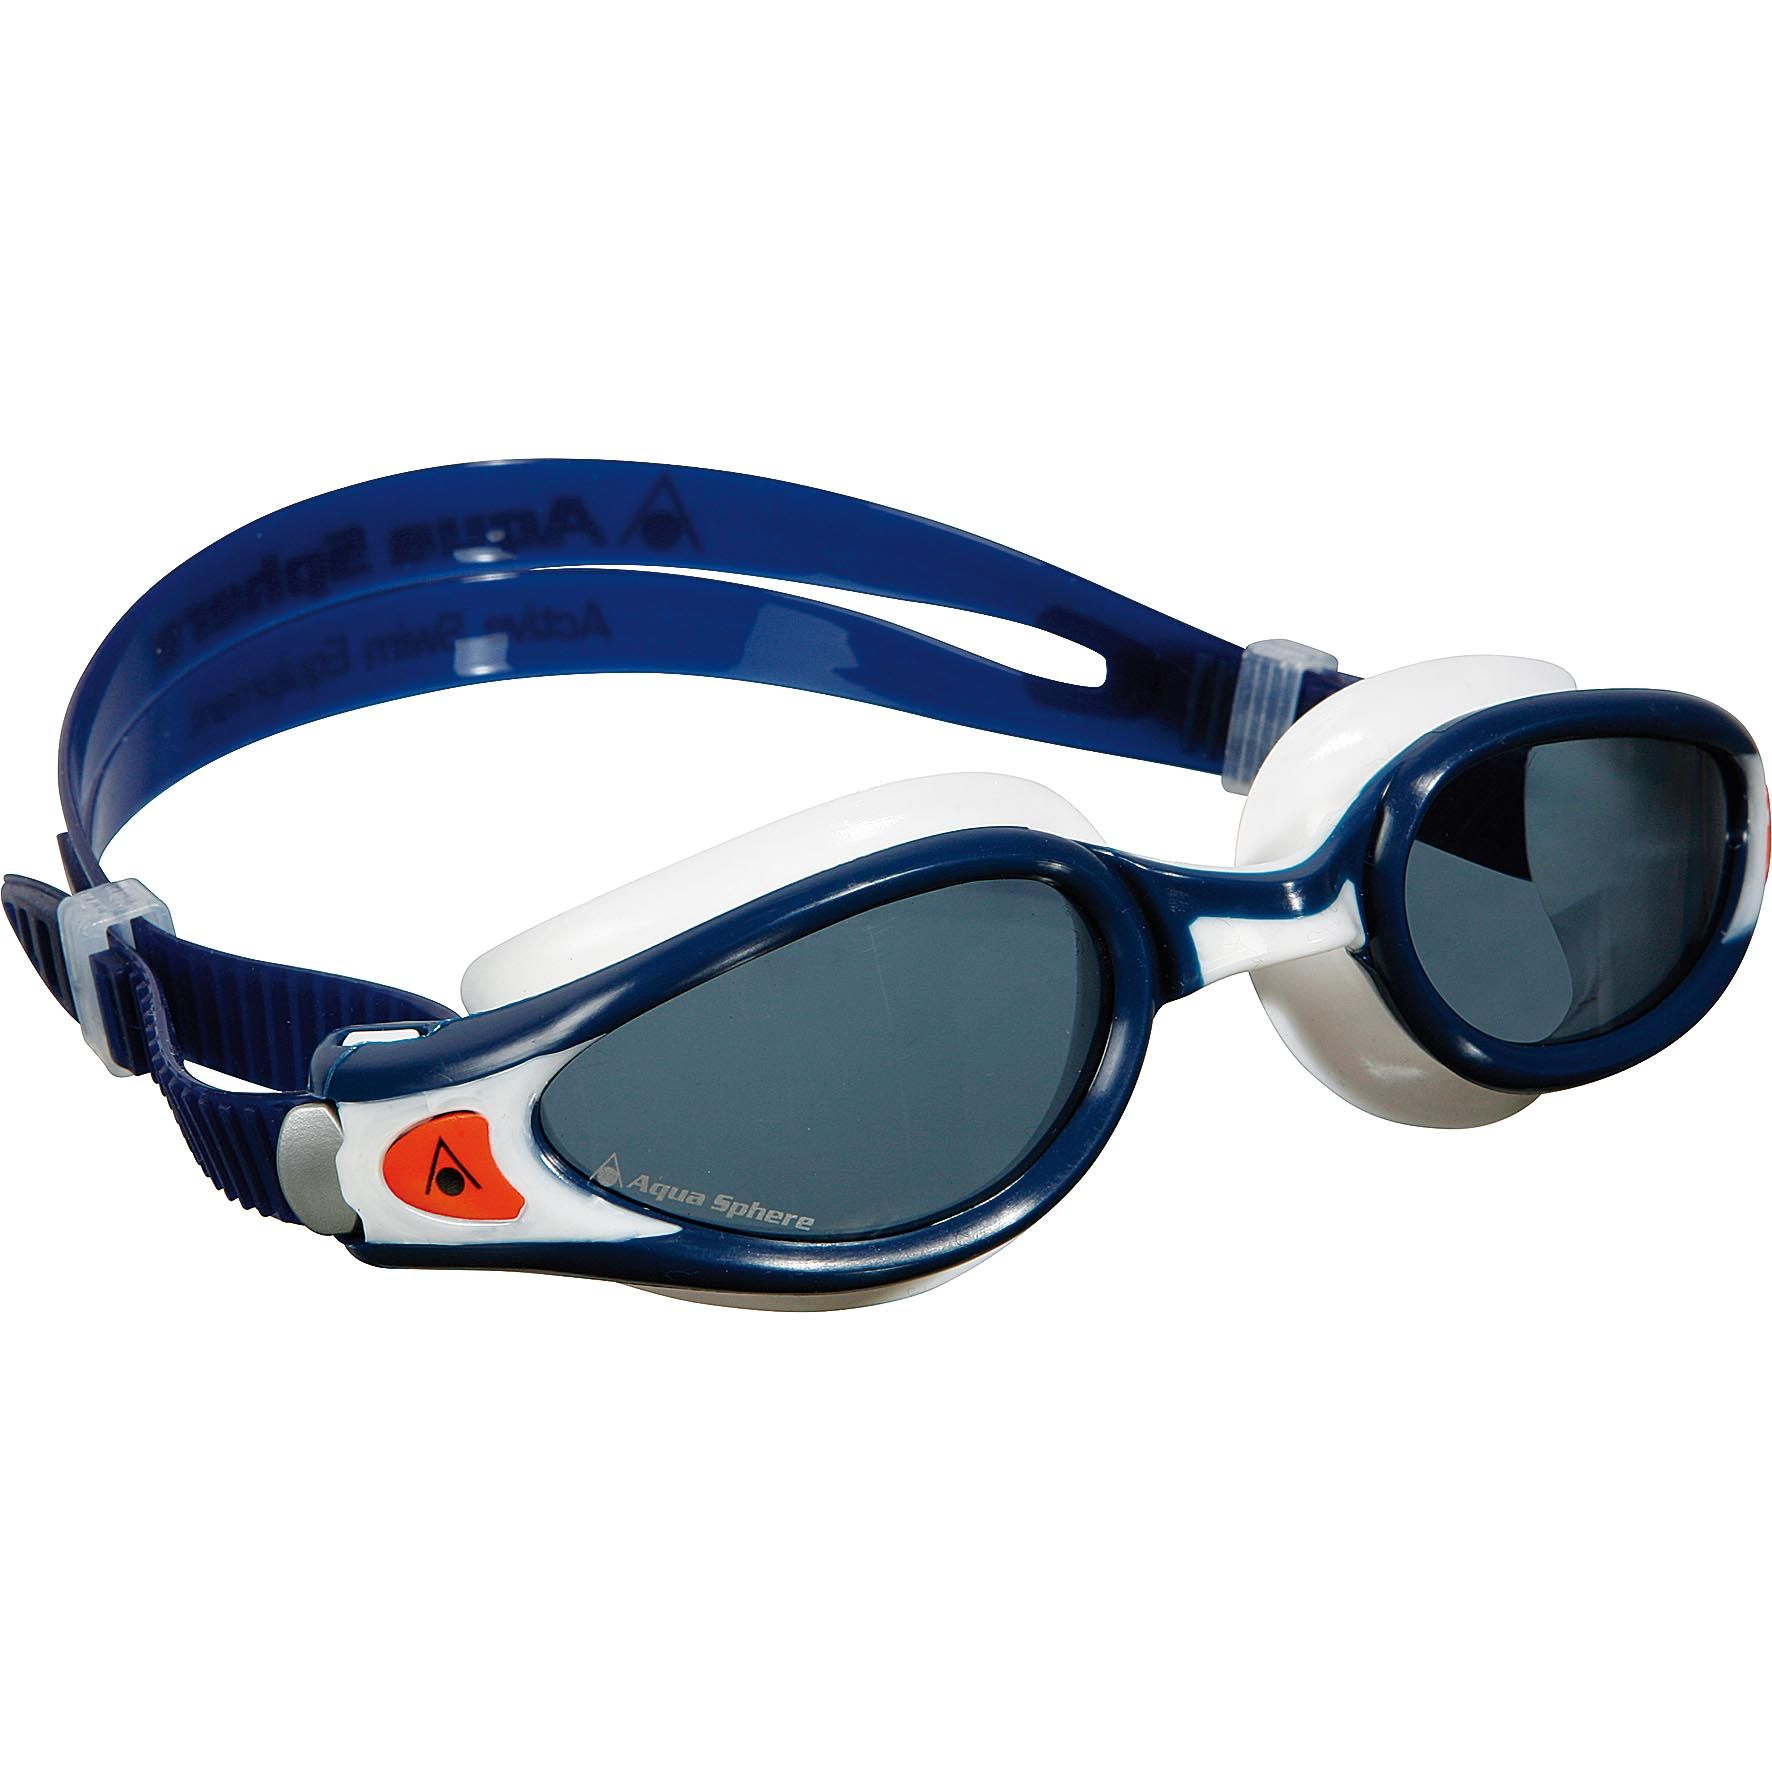 Aqua Sphere Kaiman Exo Swimming Goggles Tinted Lens